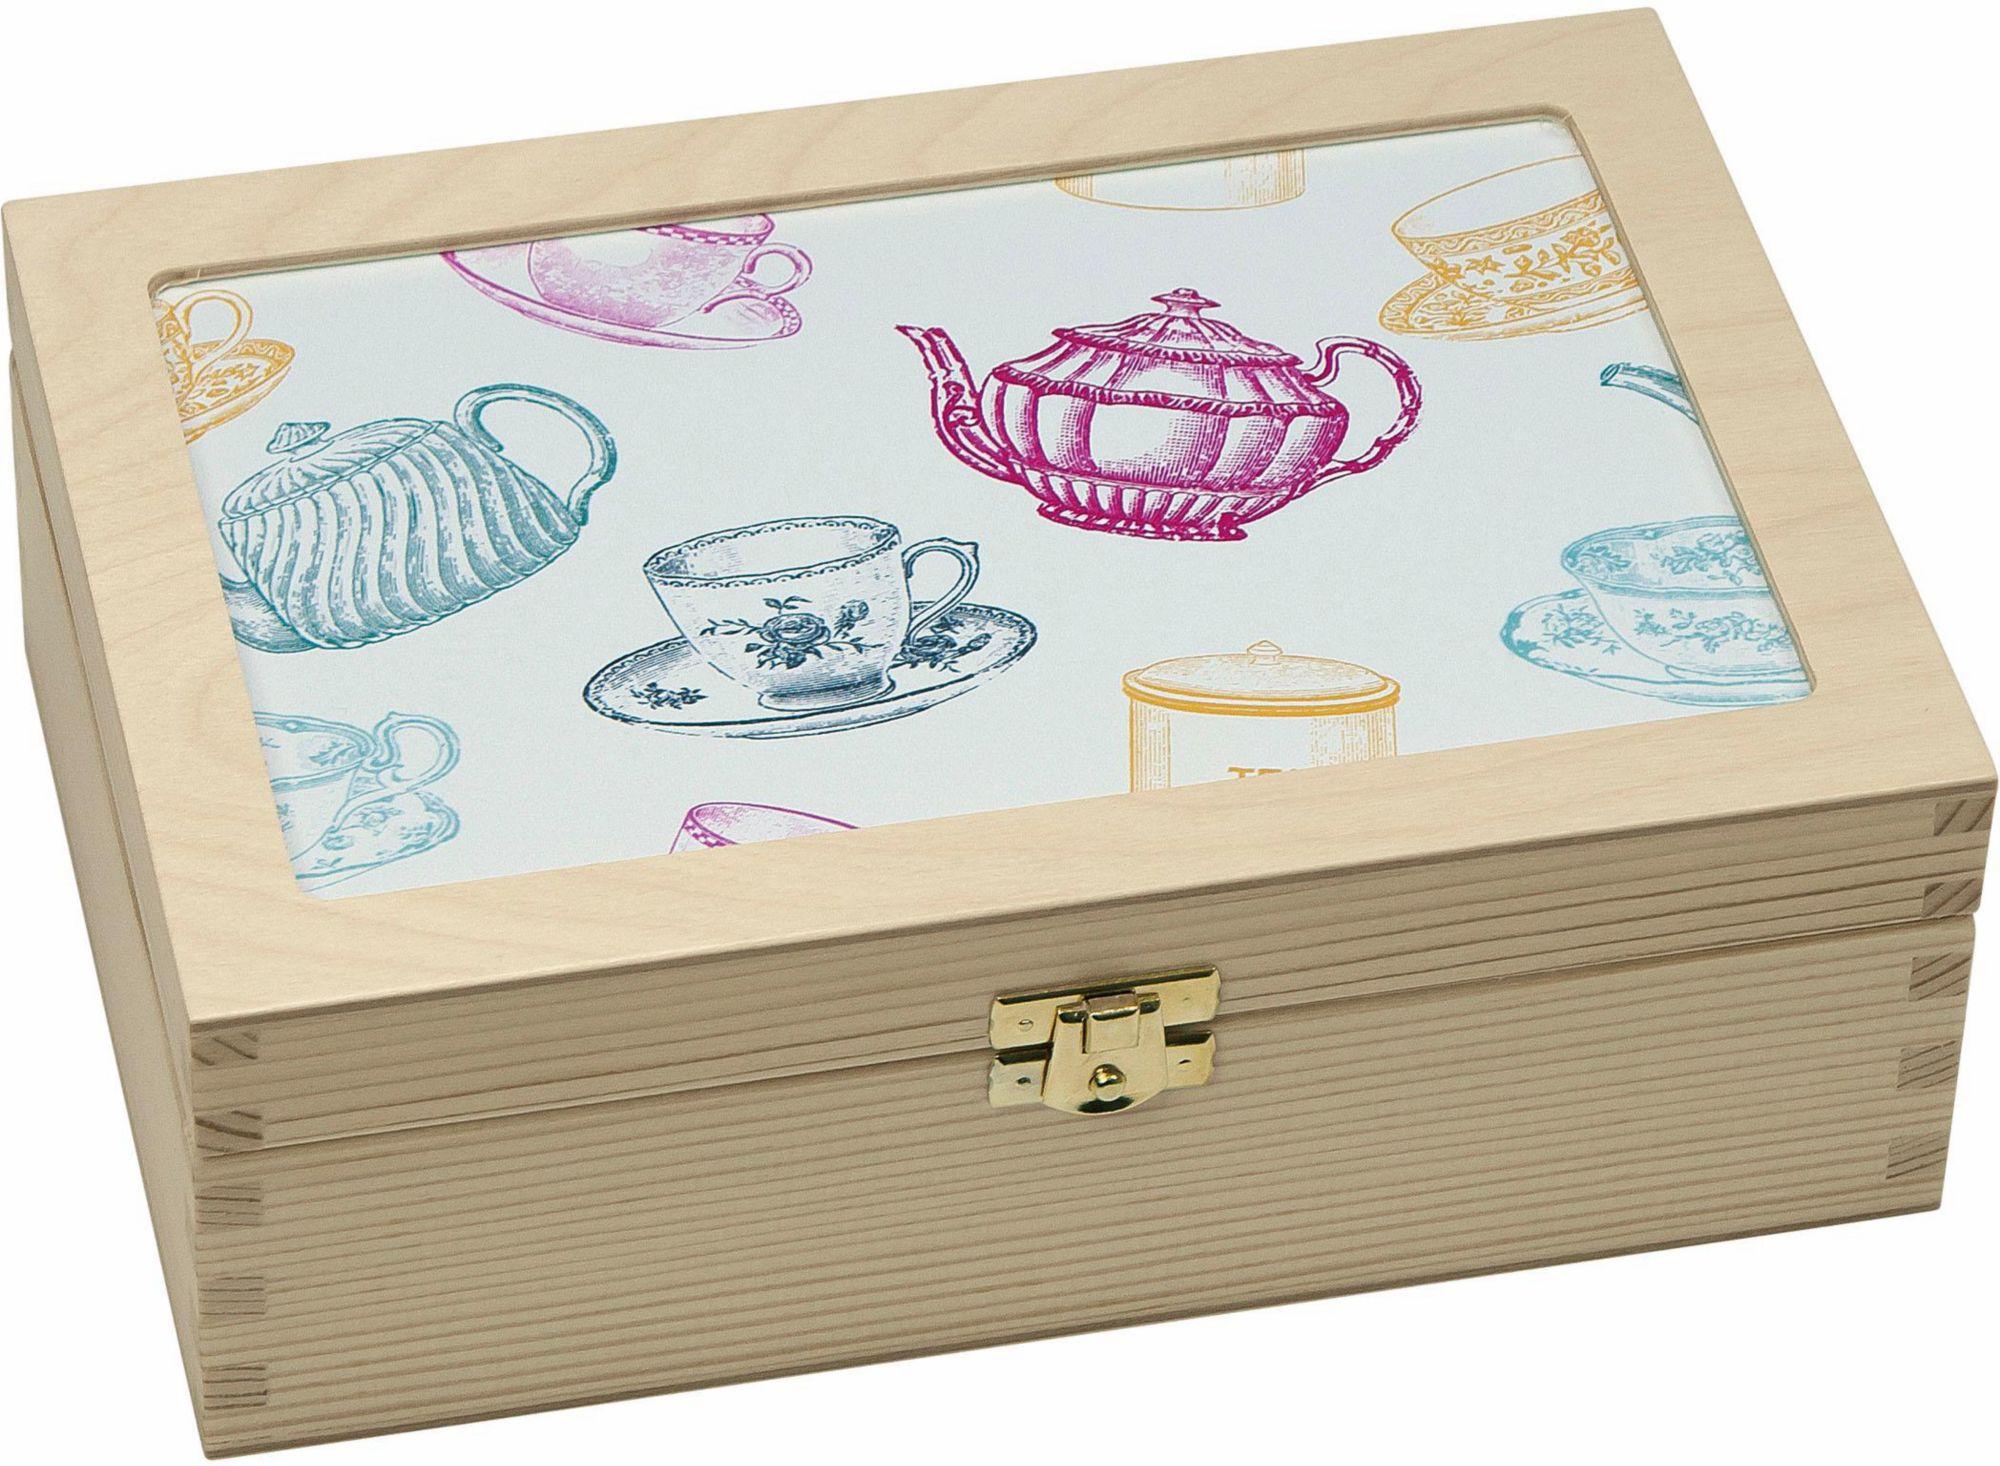 CONTENTO Contento Teebox »Tassen/Kannen grafisch«, Holz